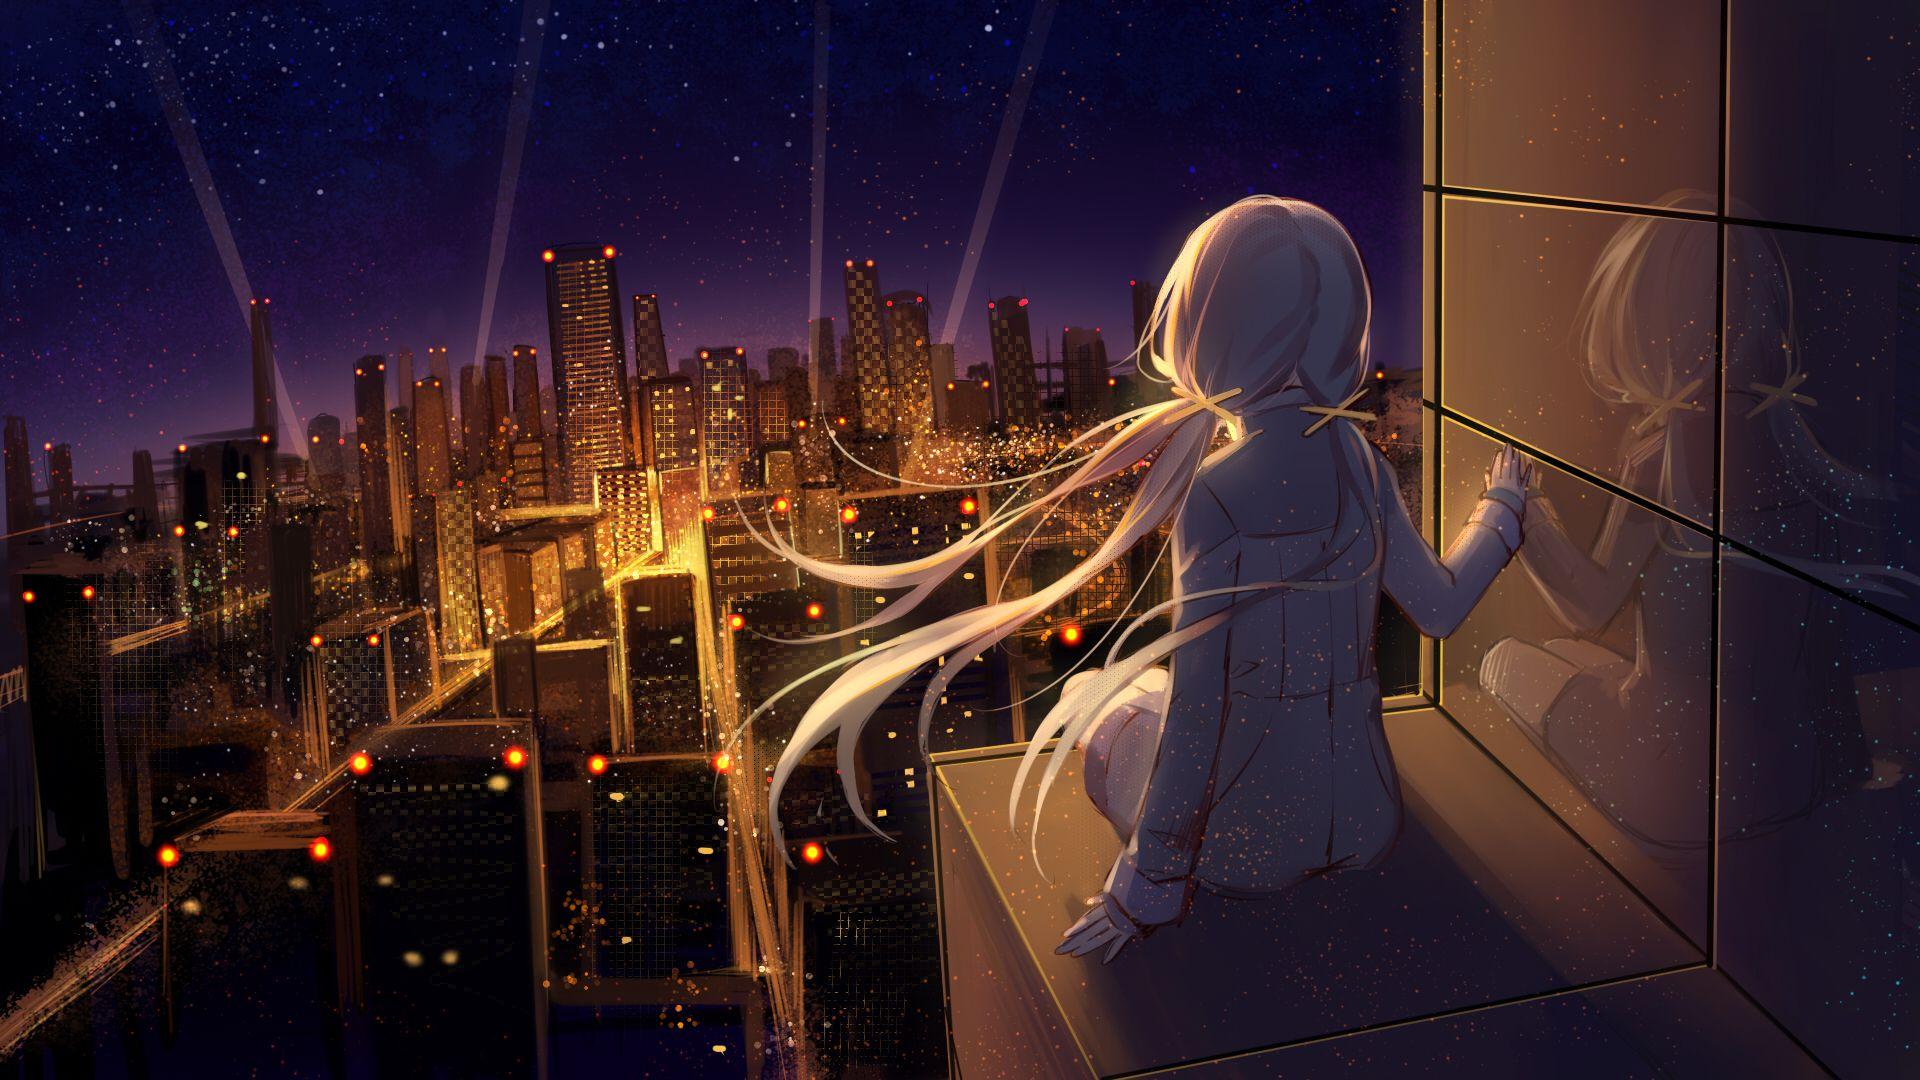 Pin By Aneta Doczy On ɑiɪmɛ ŵɑɭɭpɑpɛʁ Anime Wallpaper Download World Wallpaper Anime Scenery Wallpaper